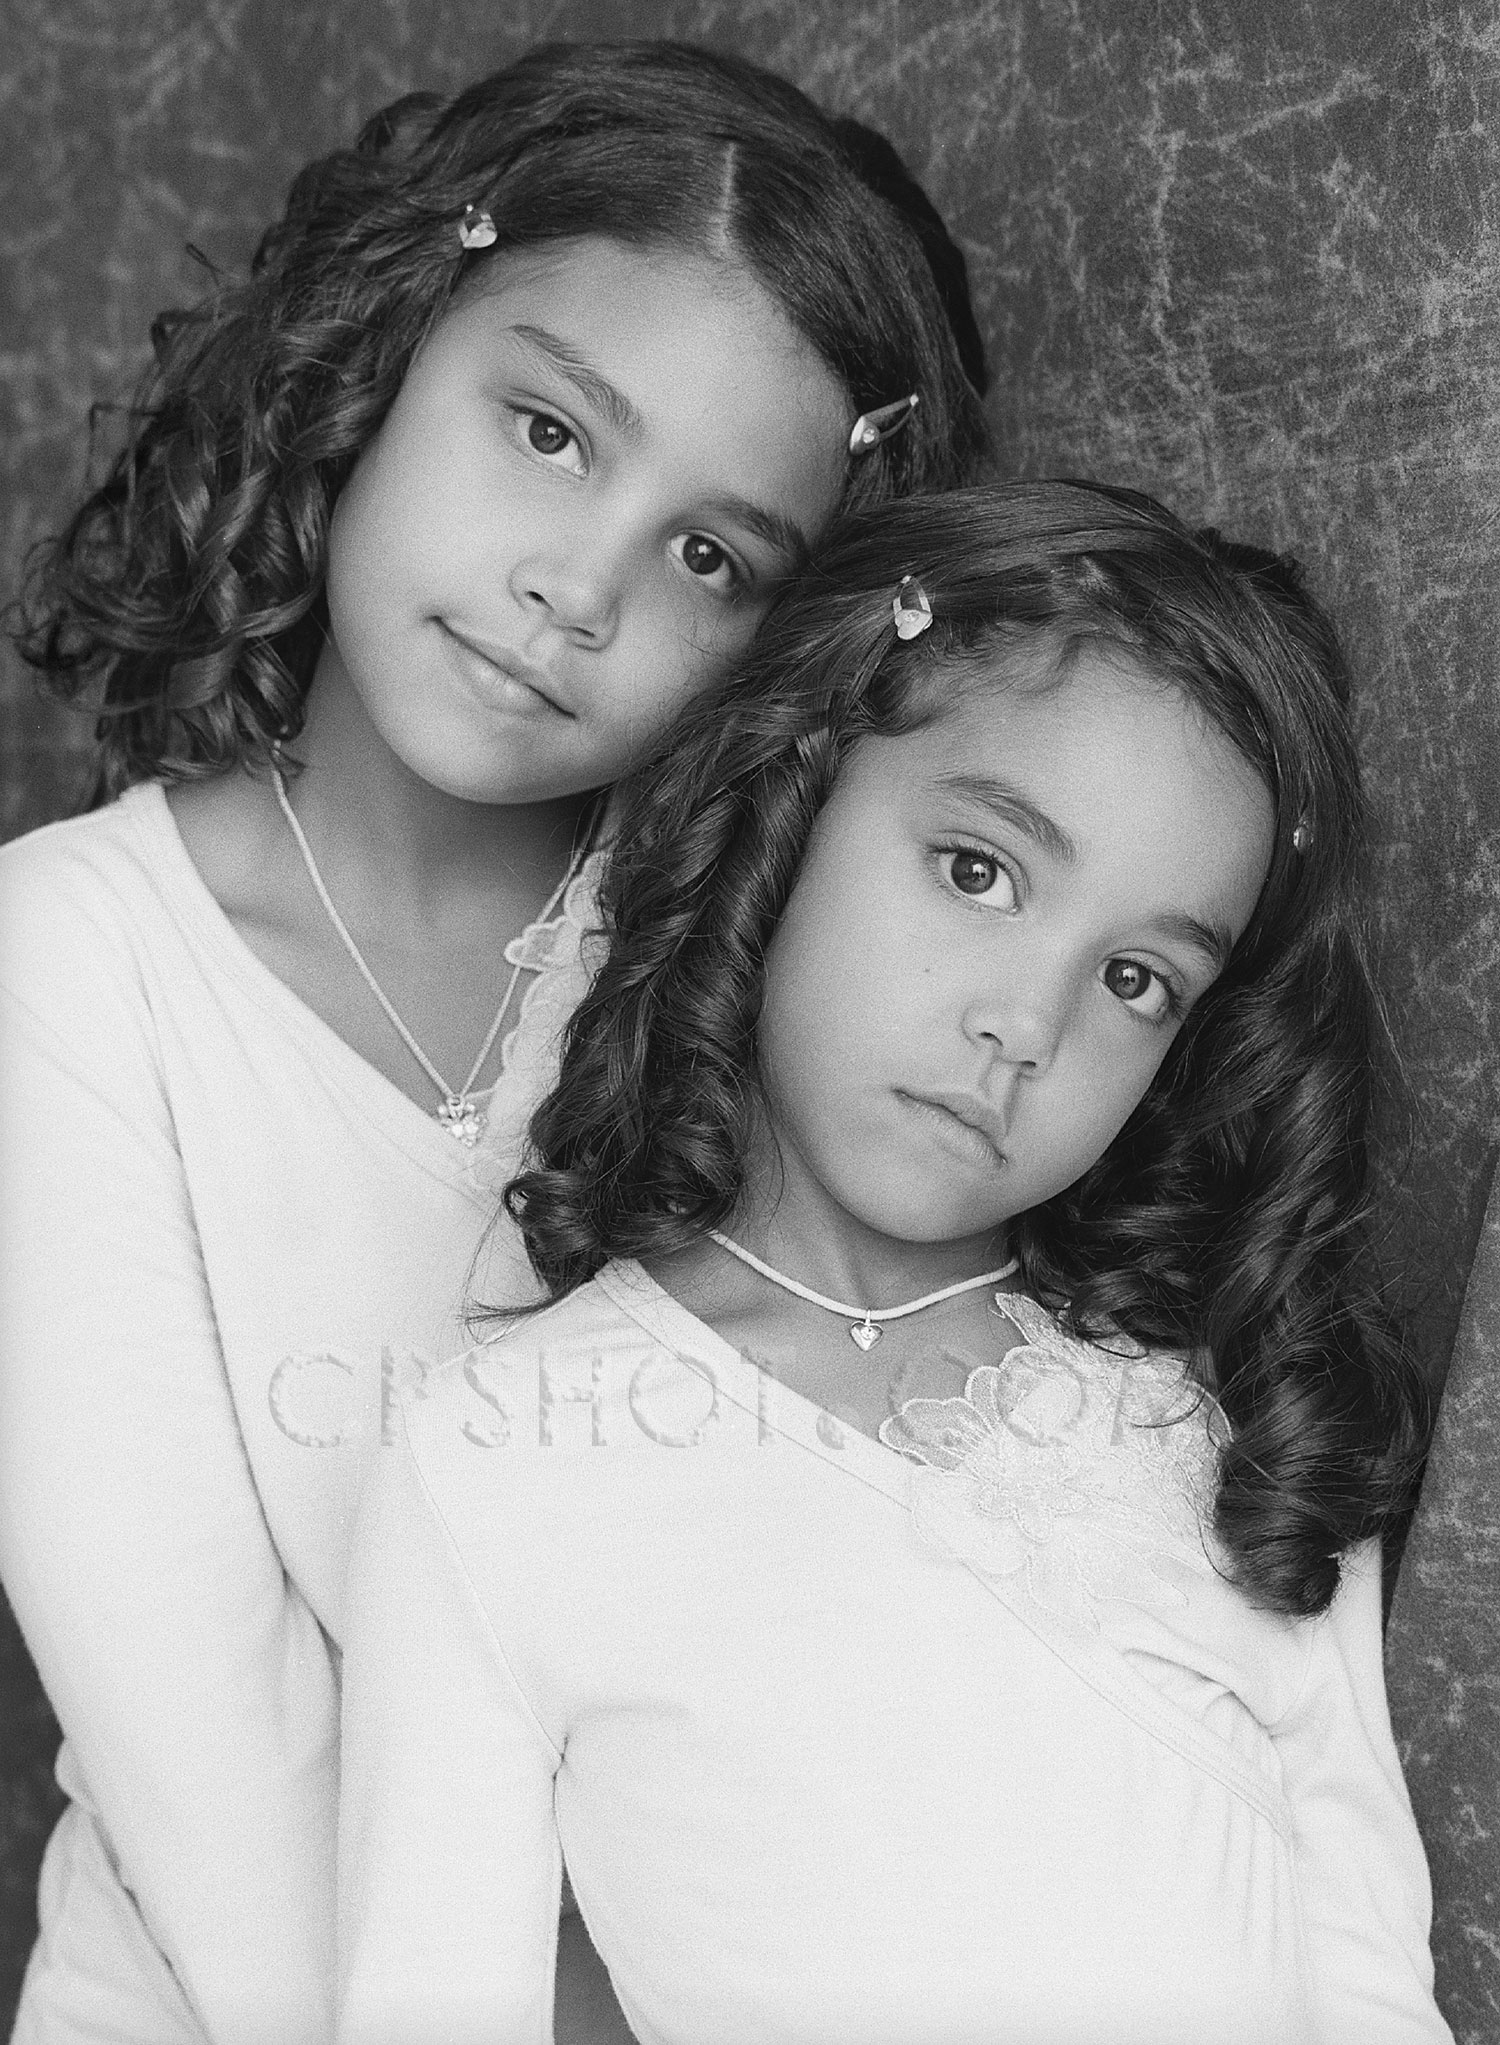 RosarioCarmenfamily-1-27___copyright_CPshot.com.jpg